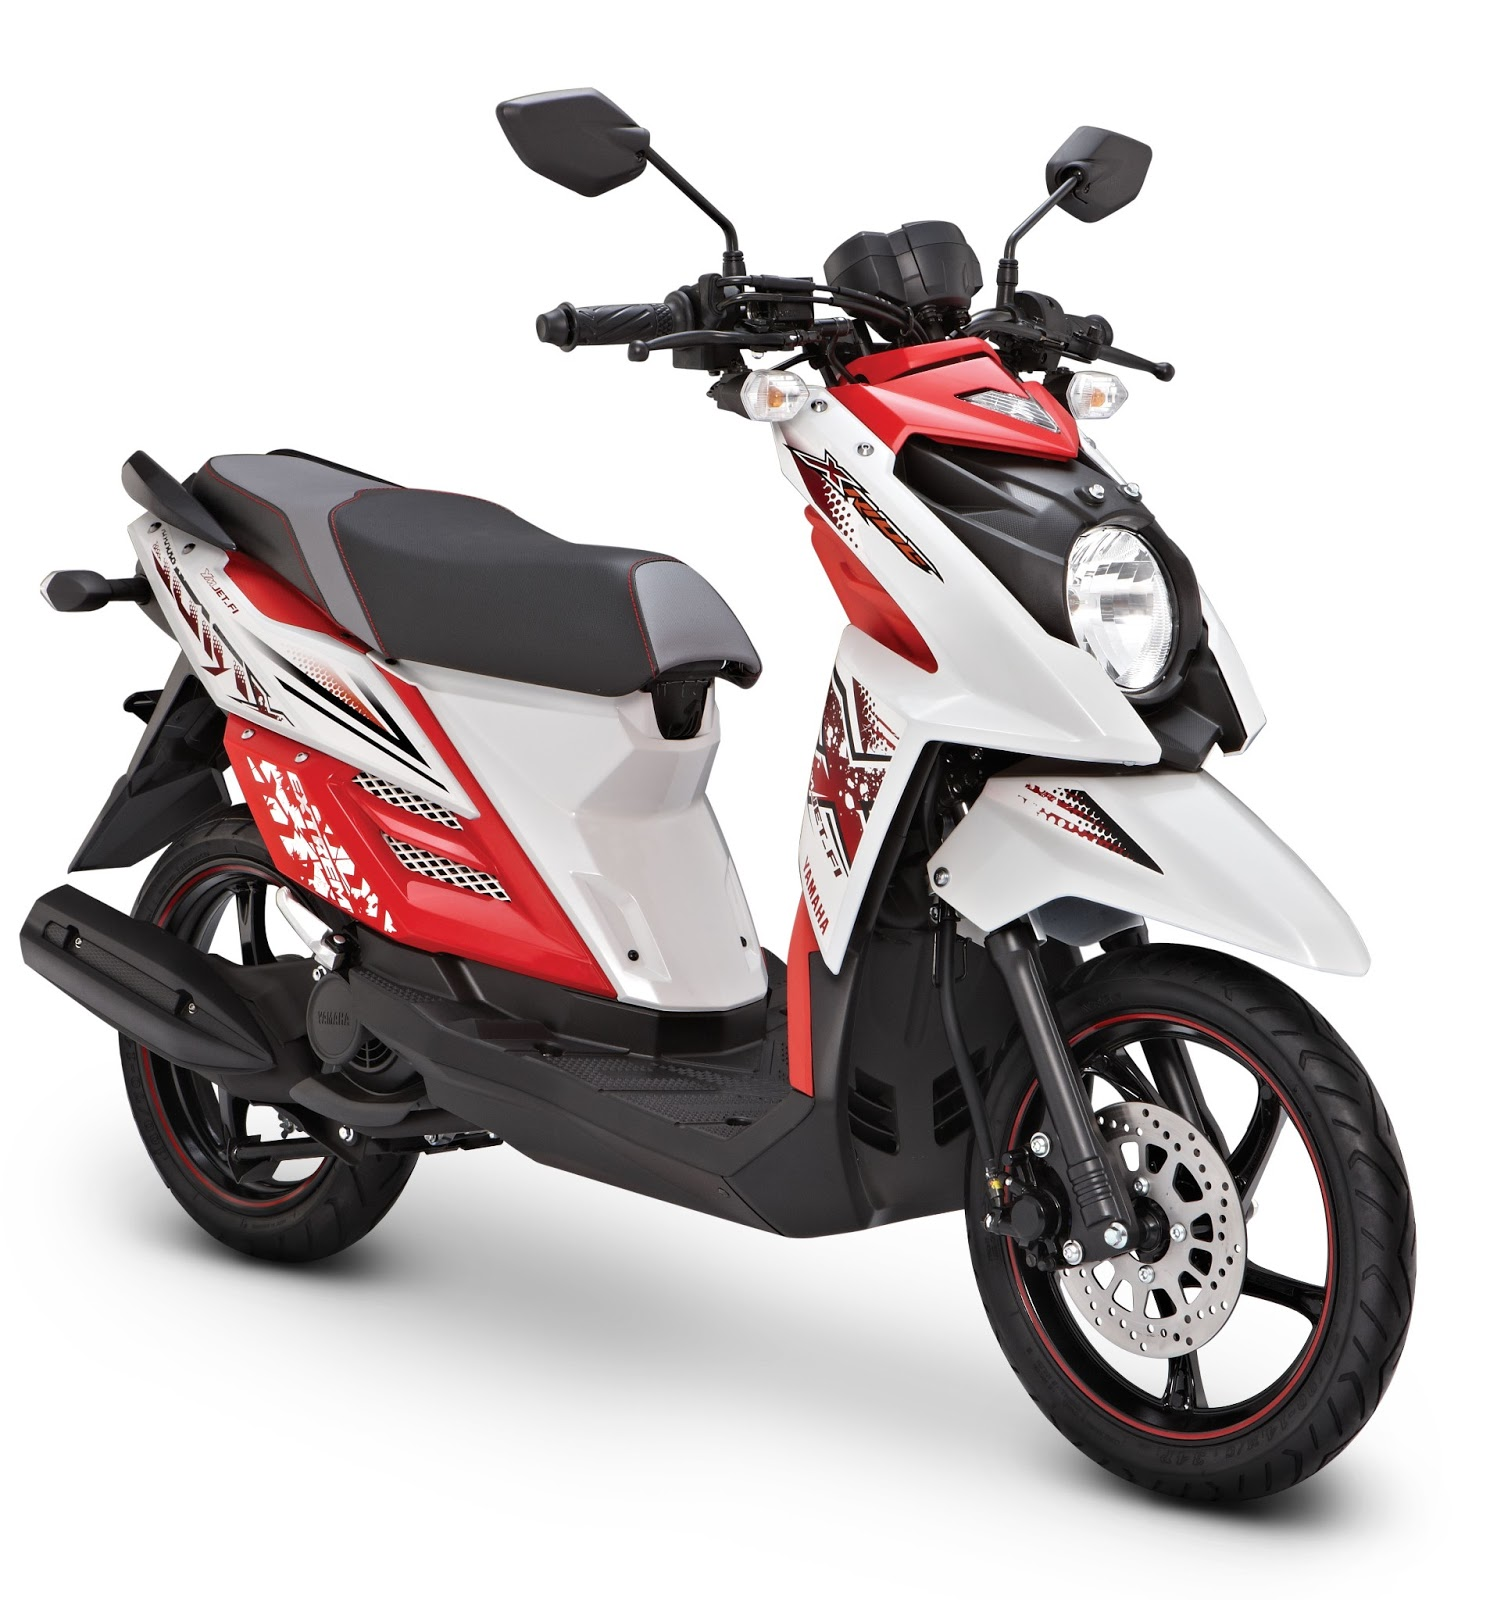 Ride Harga Dan Spesifikasi Terbaru Yamaha X Ride Adalah Produk Motor